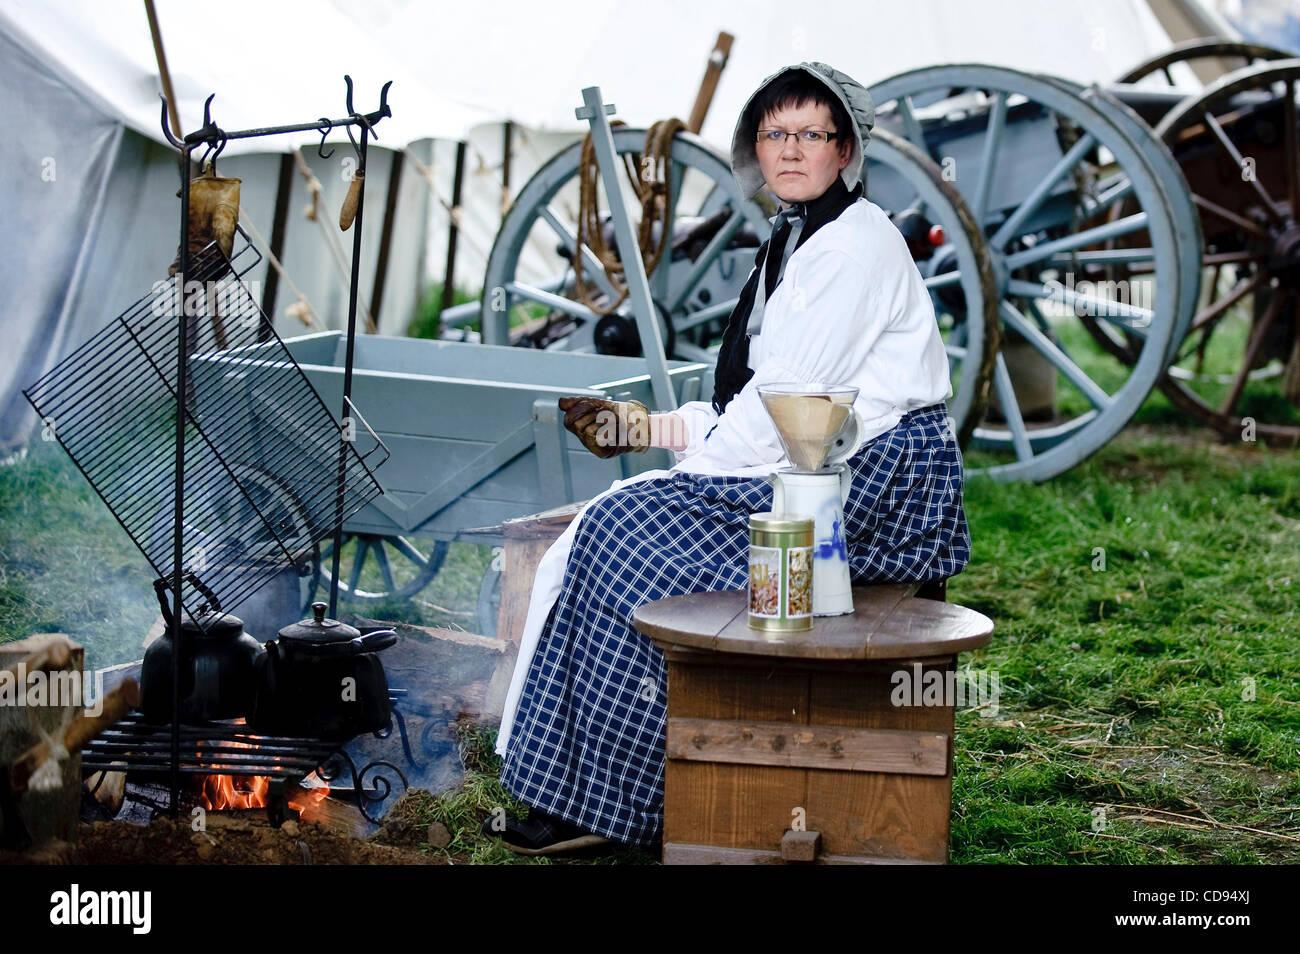 June 19, 2010 - Brussels, BXL, Belgium - Woman dressed up  during re-enactment of  the 1815 Battle of Waterloo between - Stock Image